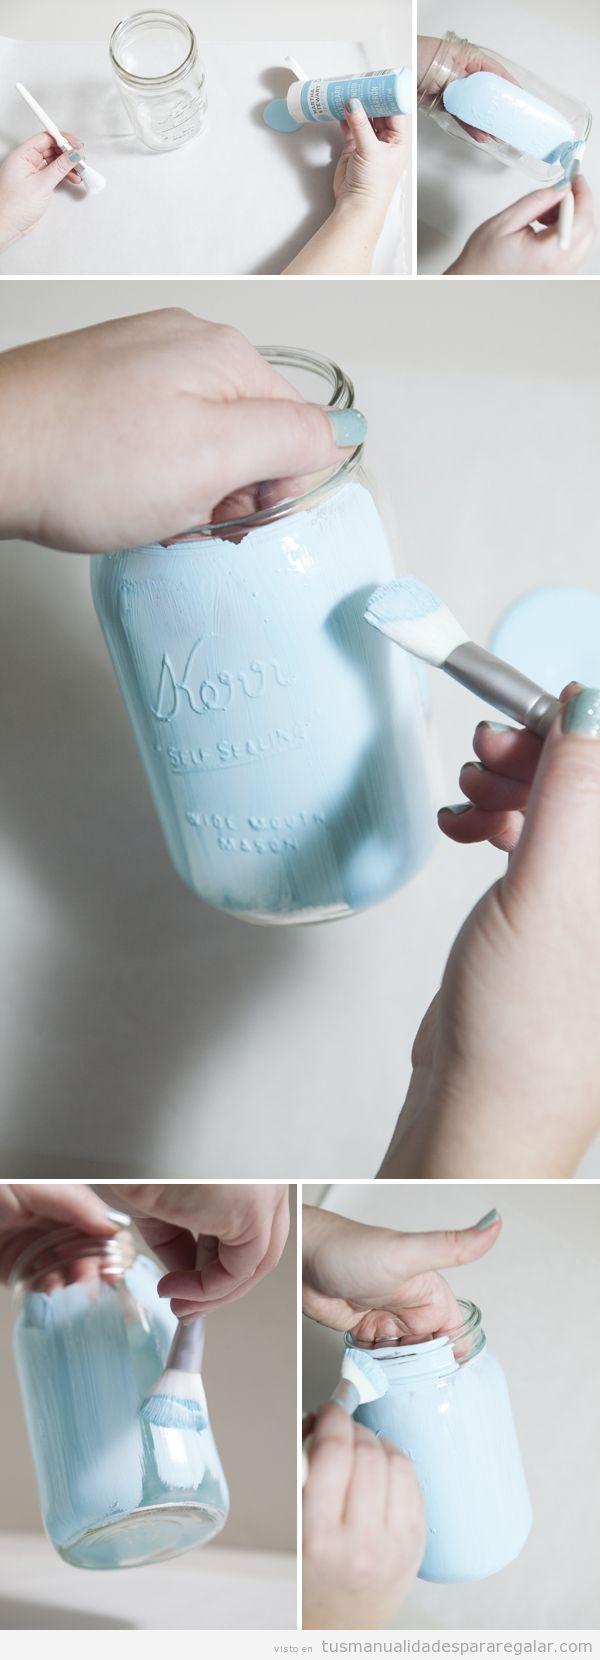 Manualidades para regalar, bote de cristal pintado, tutorial